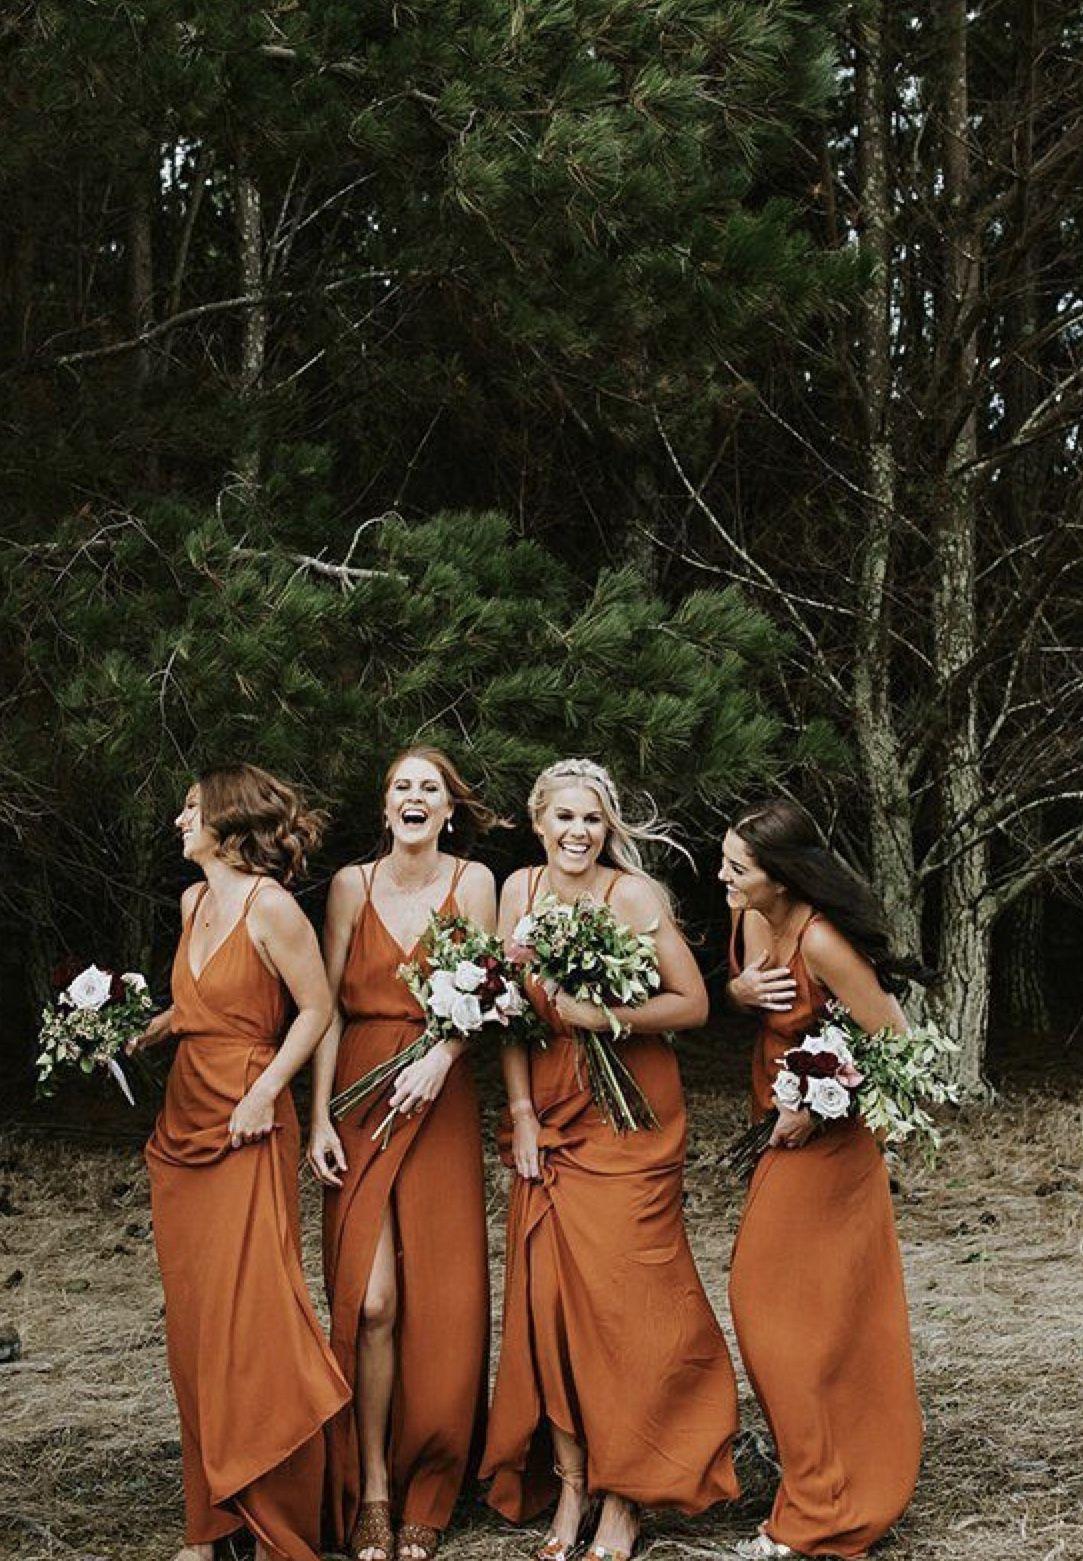 Pin By Laura Brote On Her Wedding Burnt Orange Bridesmaid Dresses Fall Bridesmaids Orange Bridesmaid Dresses [ 1561 x 1083 Pixel ]